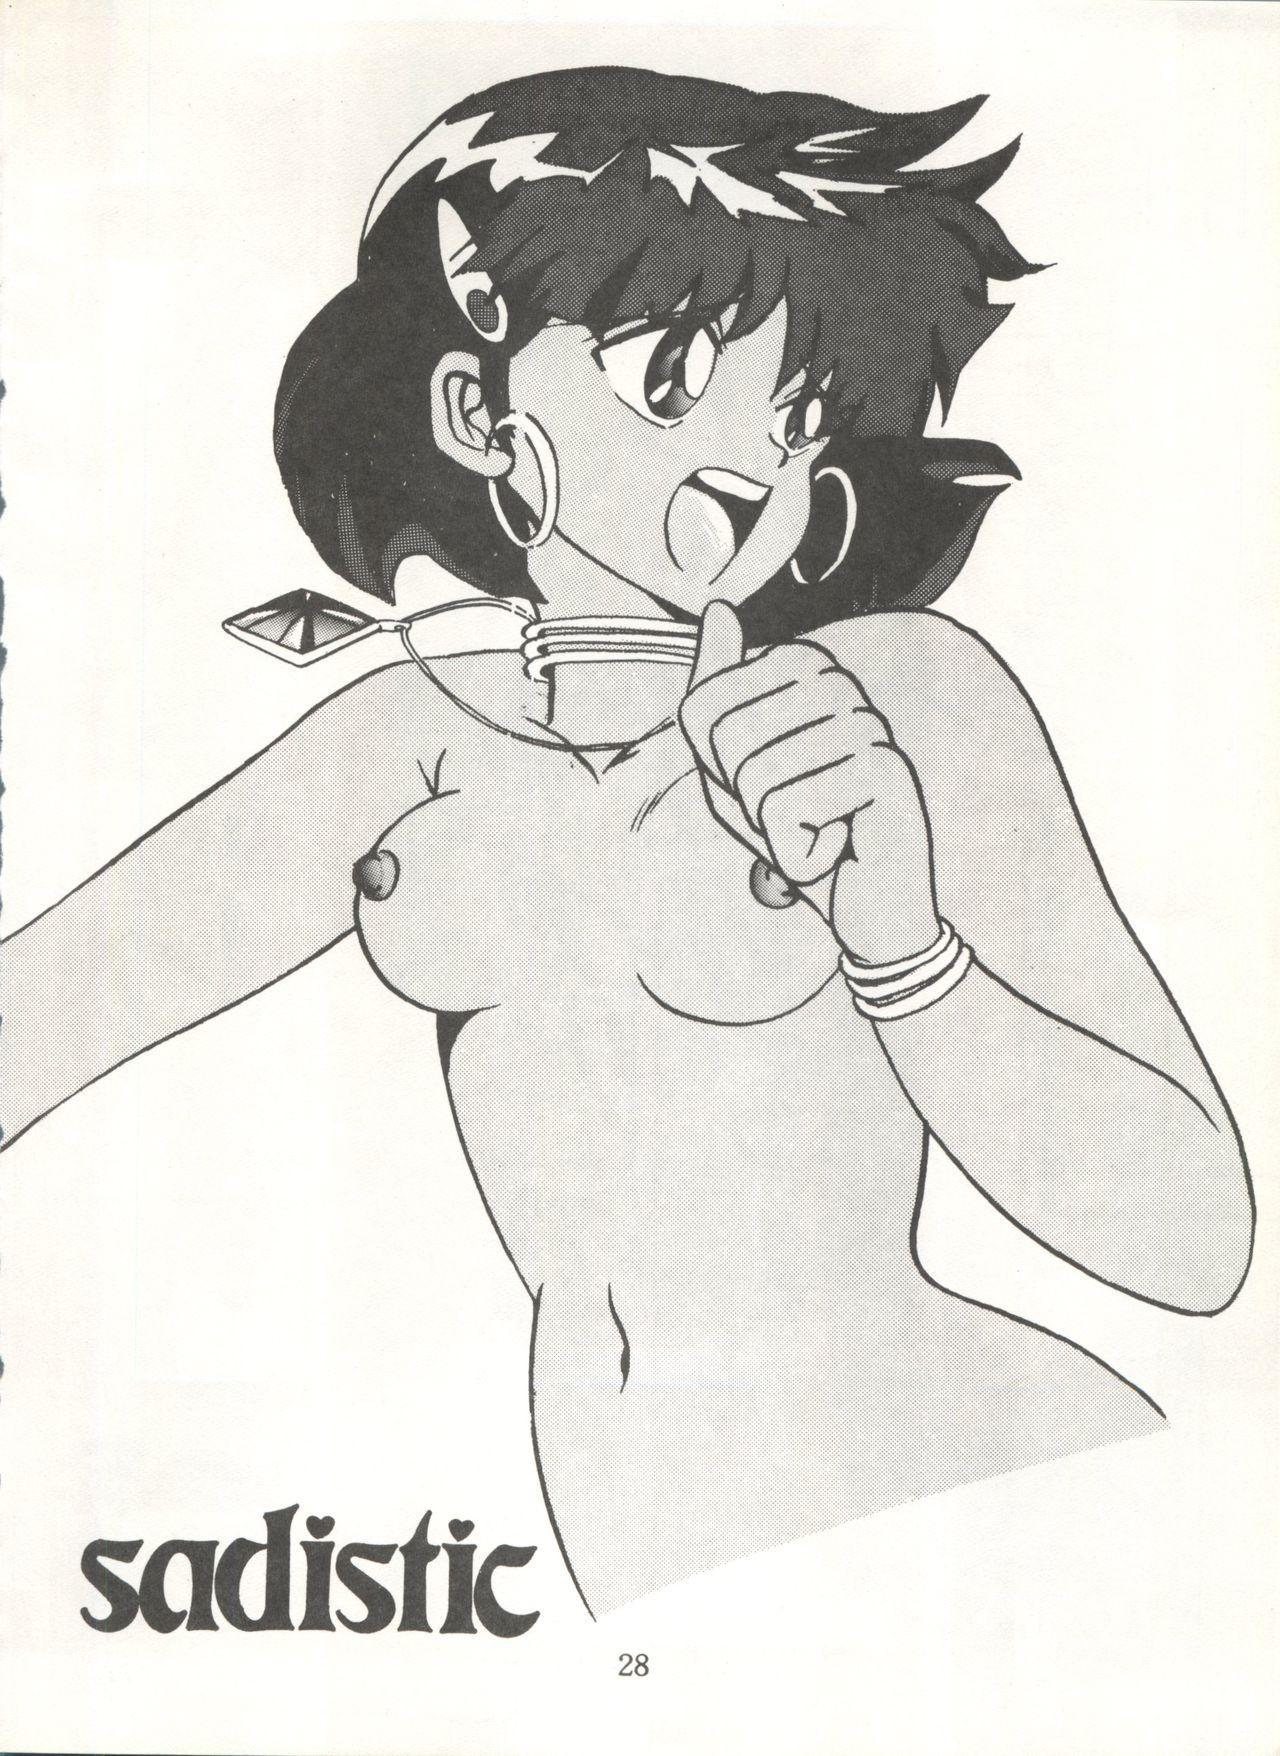 [Global One (MARO)] Sadistic 5 (Cutey Honey, Devilman, Sailor Moon), [Global One (MARO)] Sadistic (Dirty Pair, Fushigi no Umi no Nadia, Sailor Moon), [Studio Ikkatsumajin] .ribbon (Hime-chan's Ribbon) 87